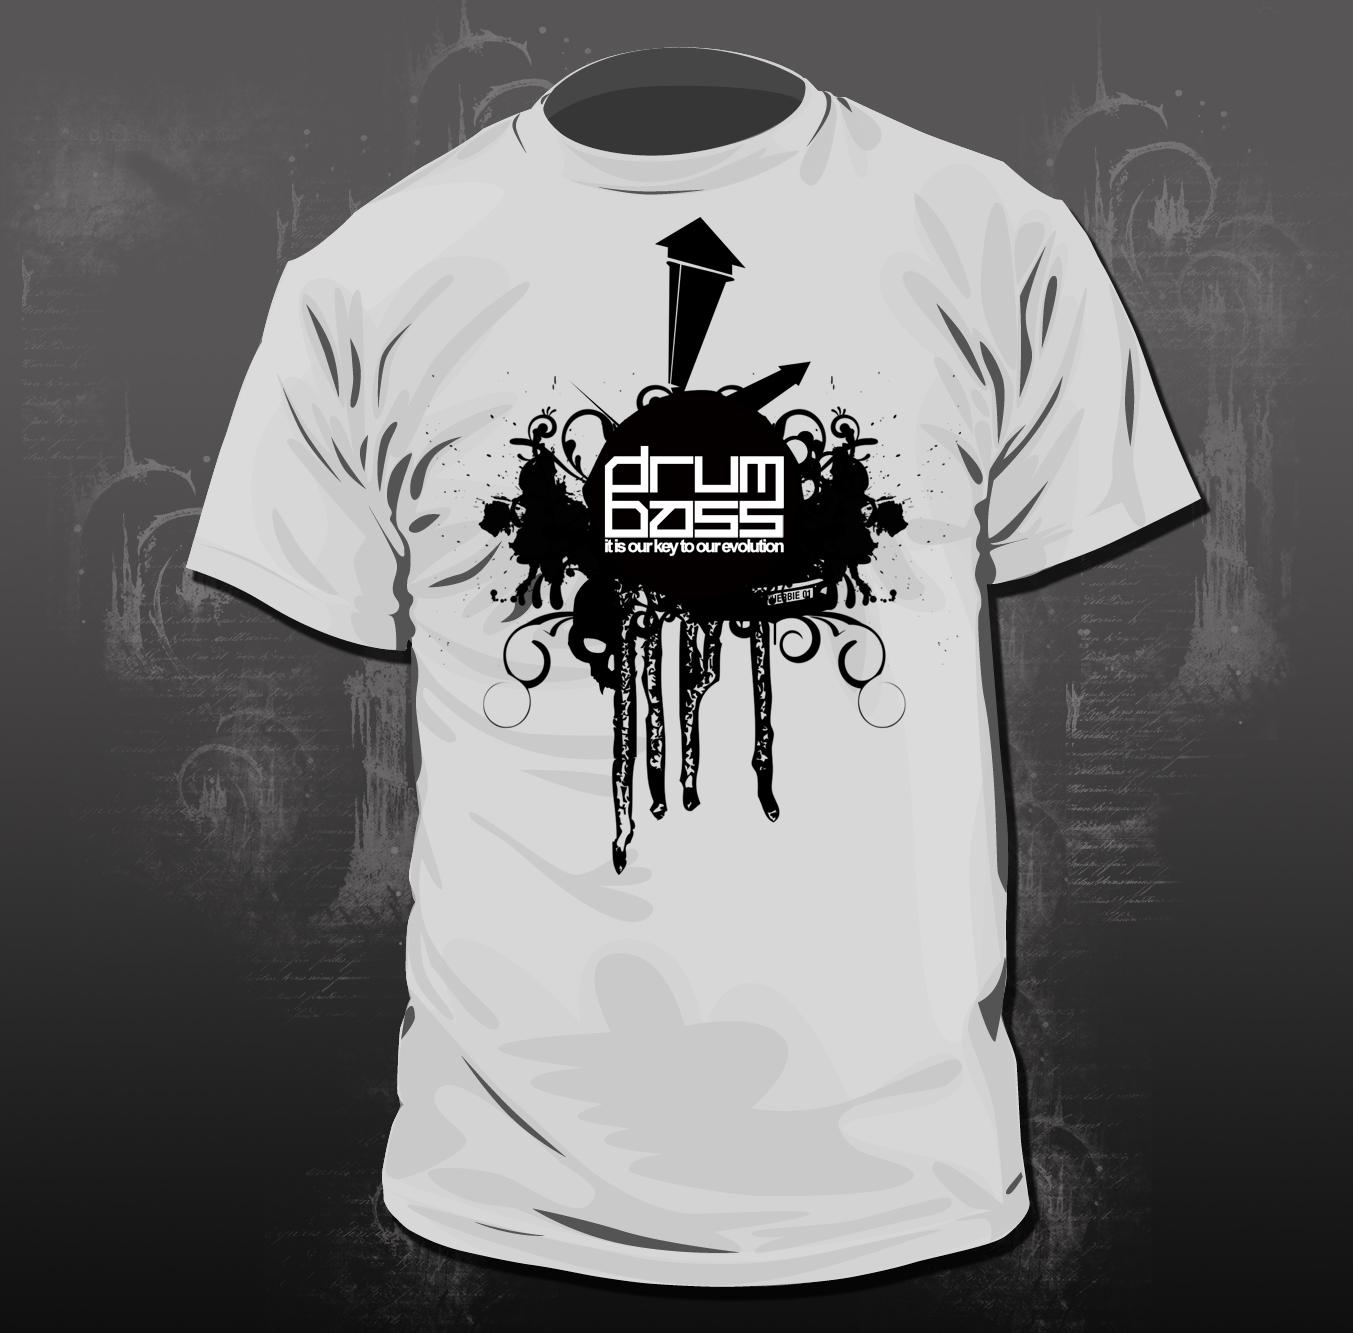 stunning t shirt logo design ideas gallery trend ideas 2017 - T Shirt Logo Design Ideas